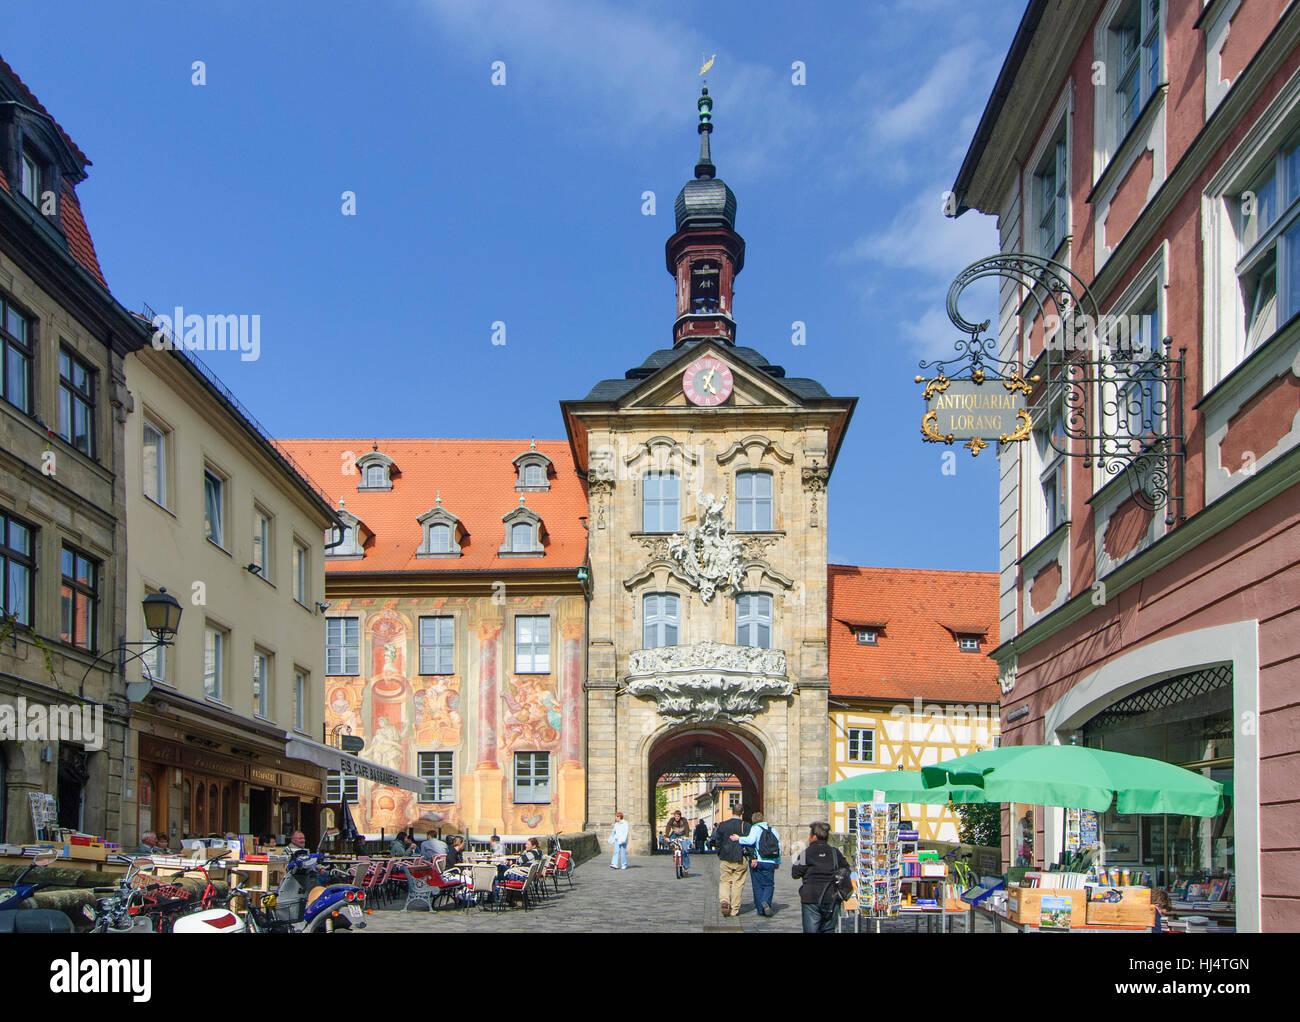 Bamberg Karolinenstr Antiquitäten : Antiquitäten senger in bamberg ⇒ in das Örtliche